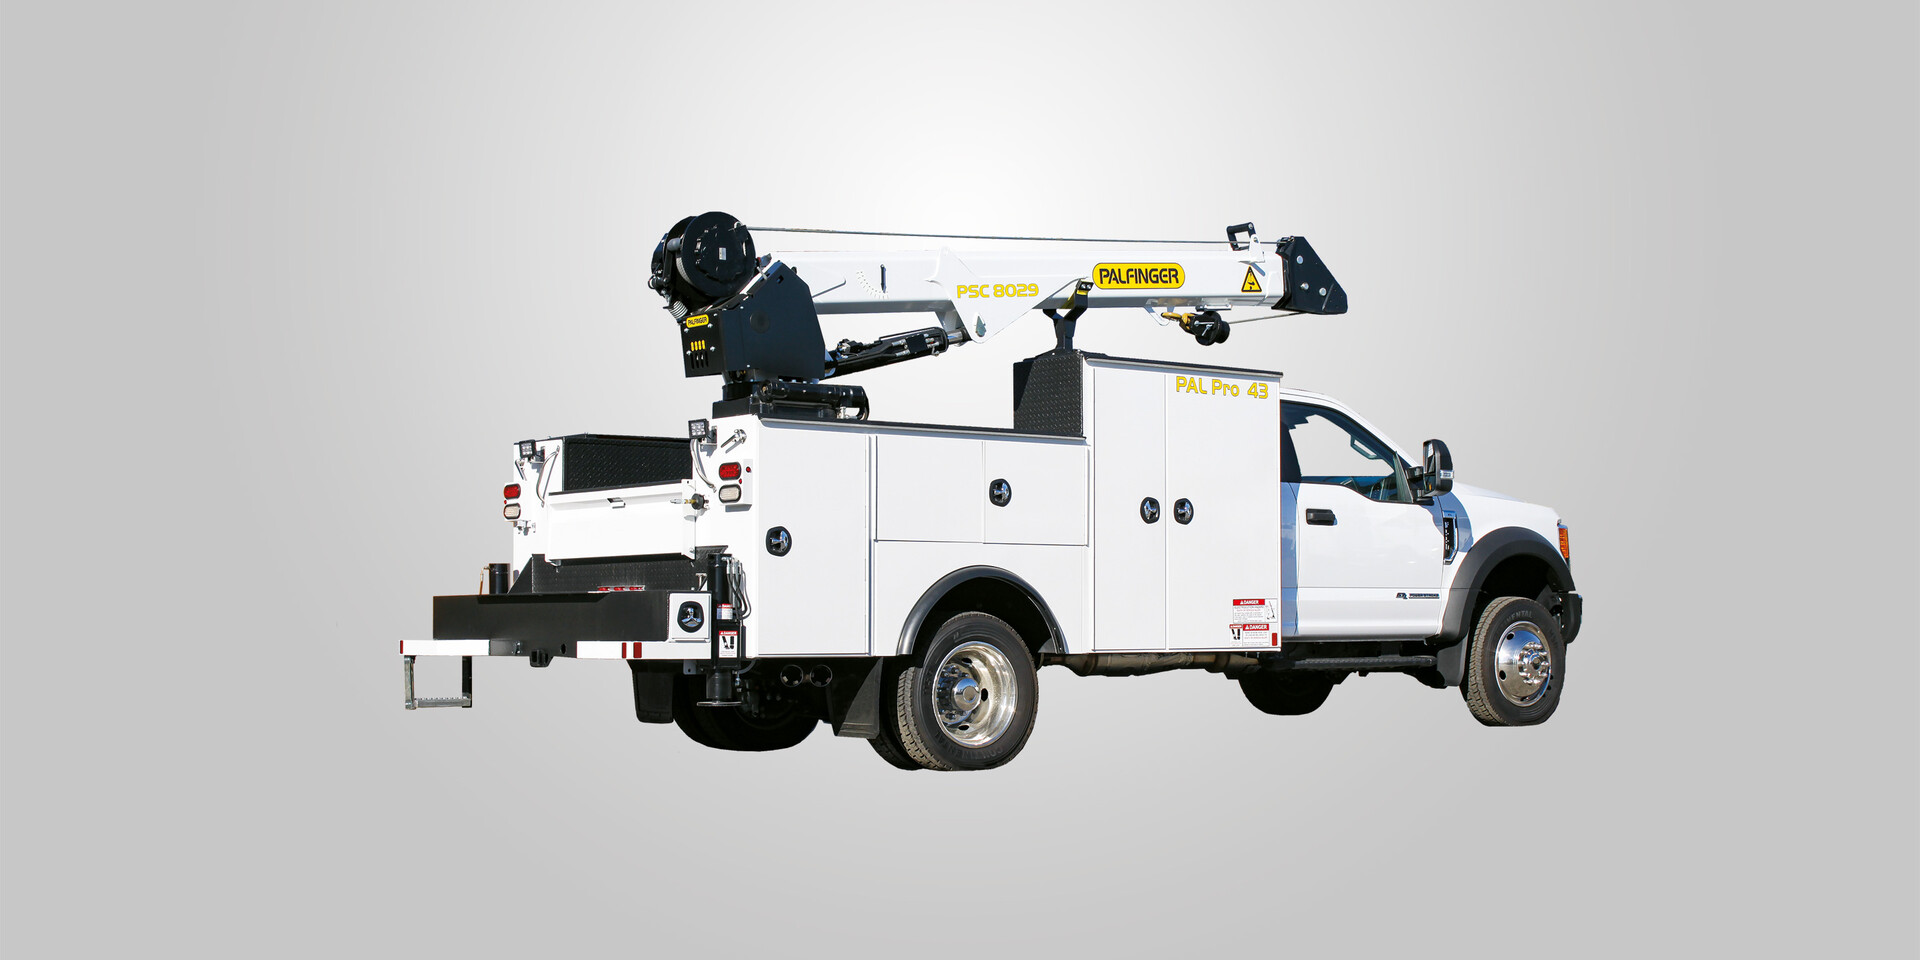 PAL Pro 43 Mechanics Truck